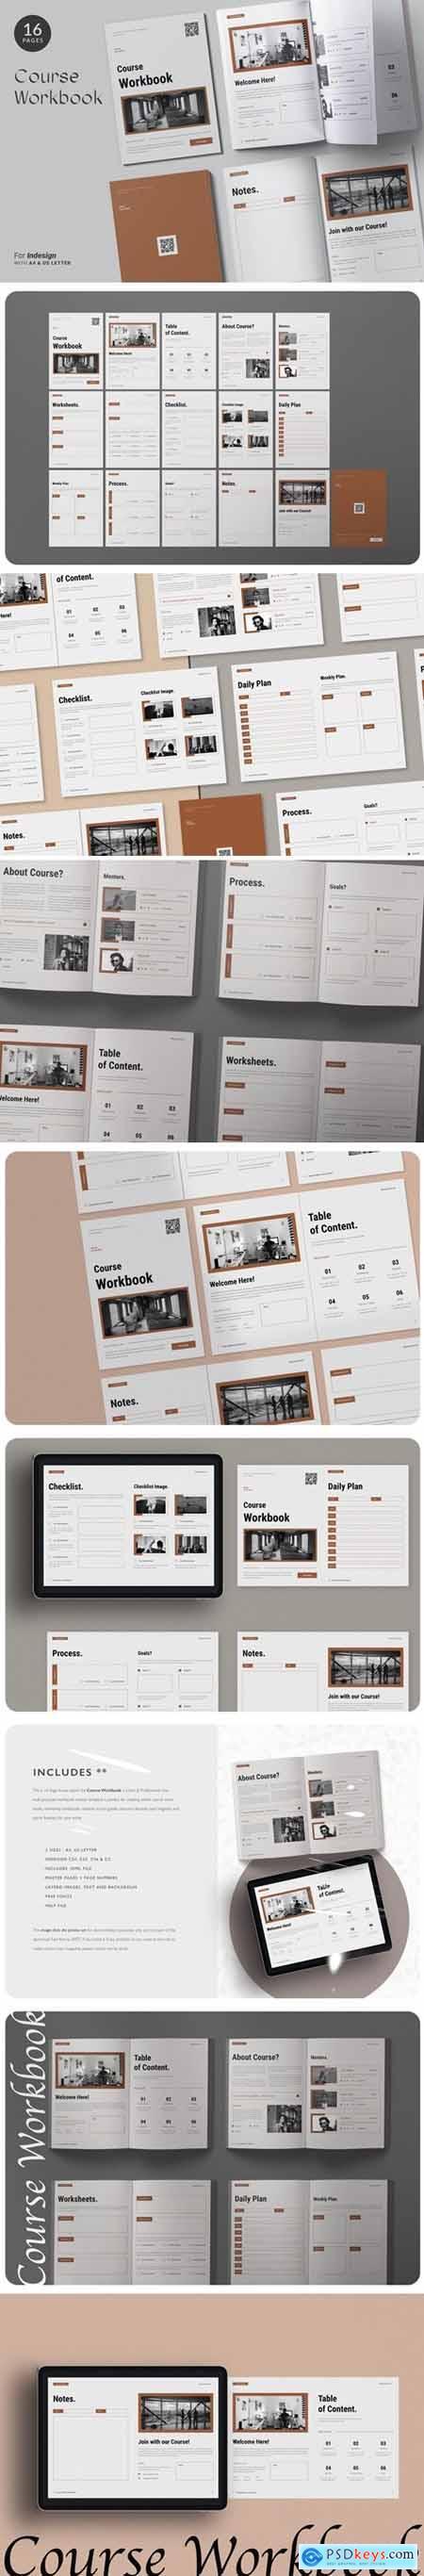 The Course Workbook - Minimal 6MHALQW